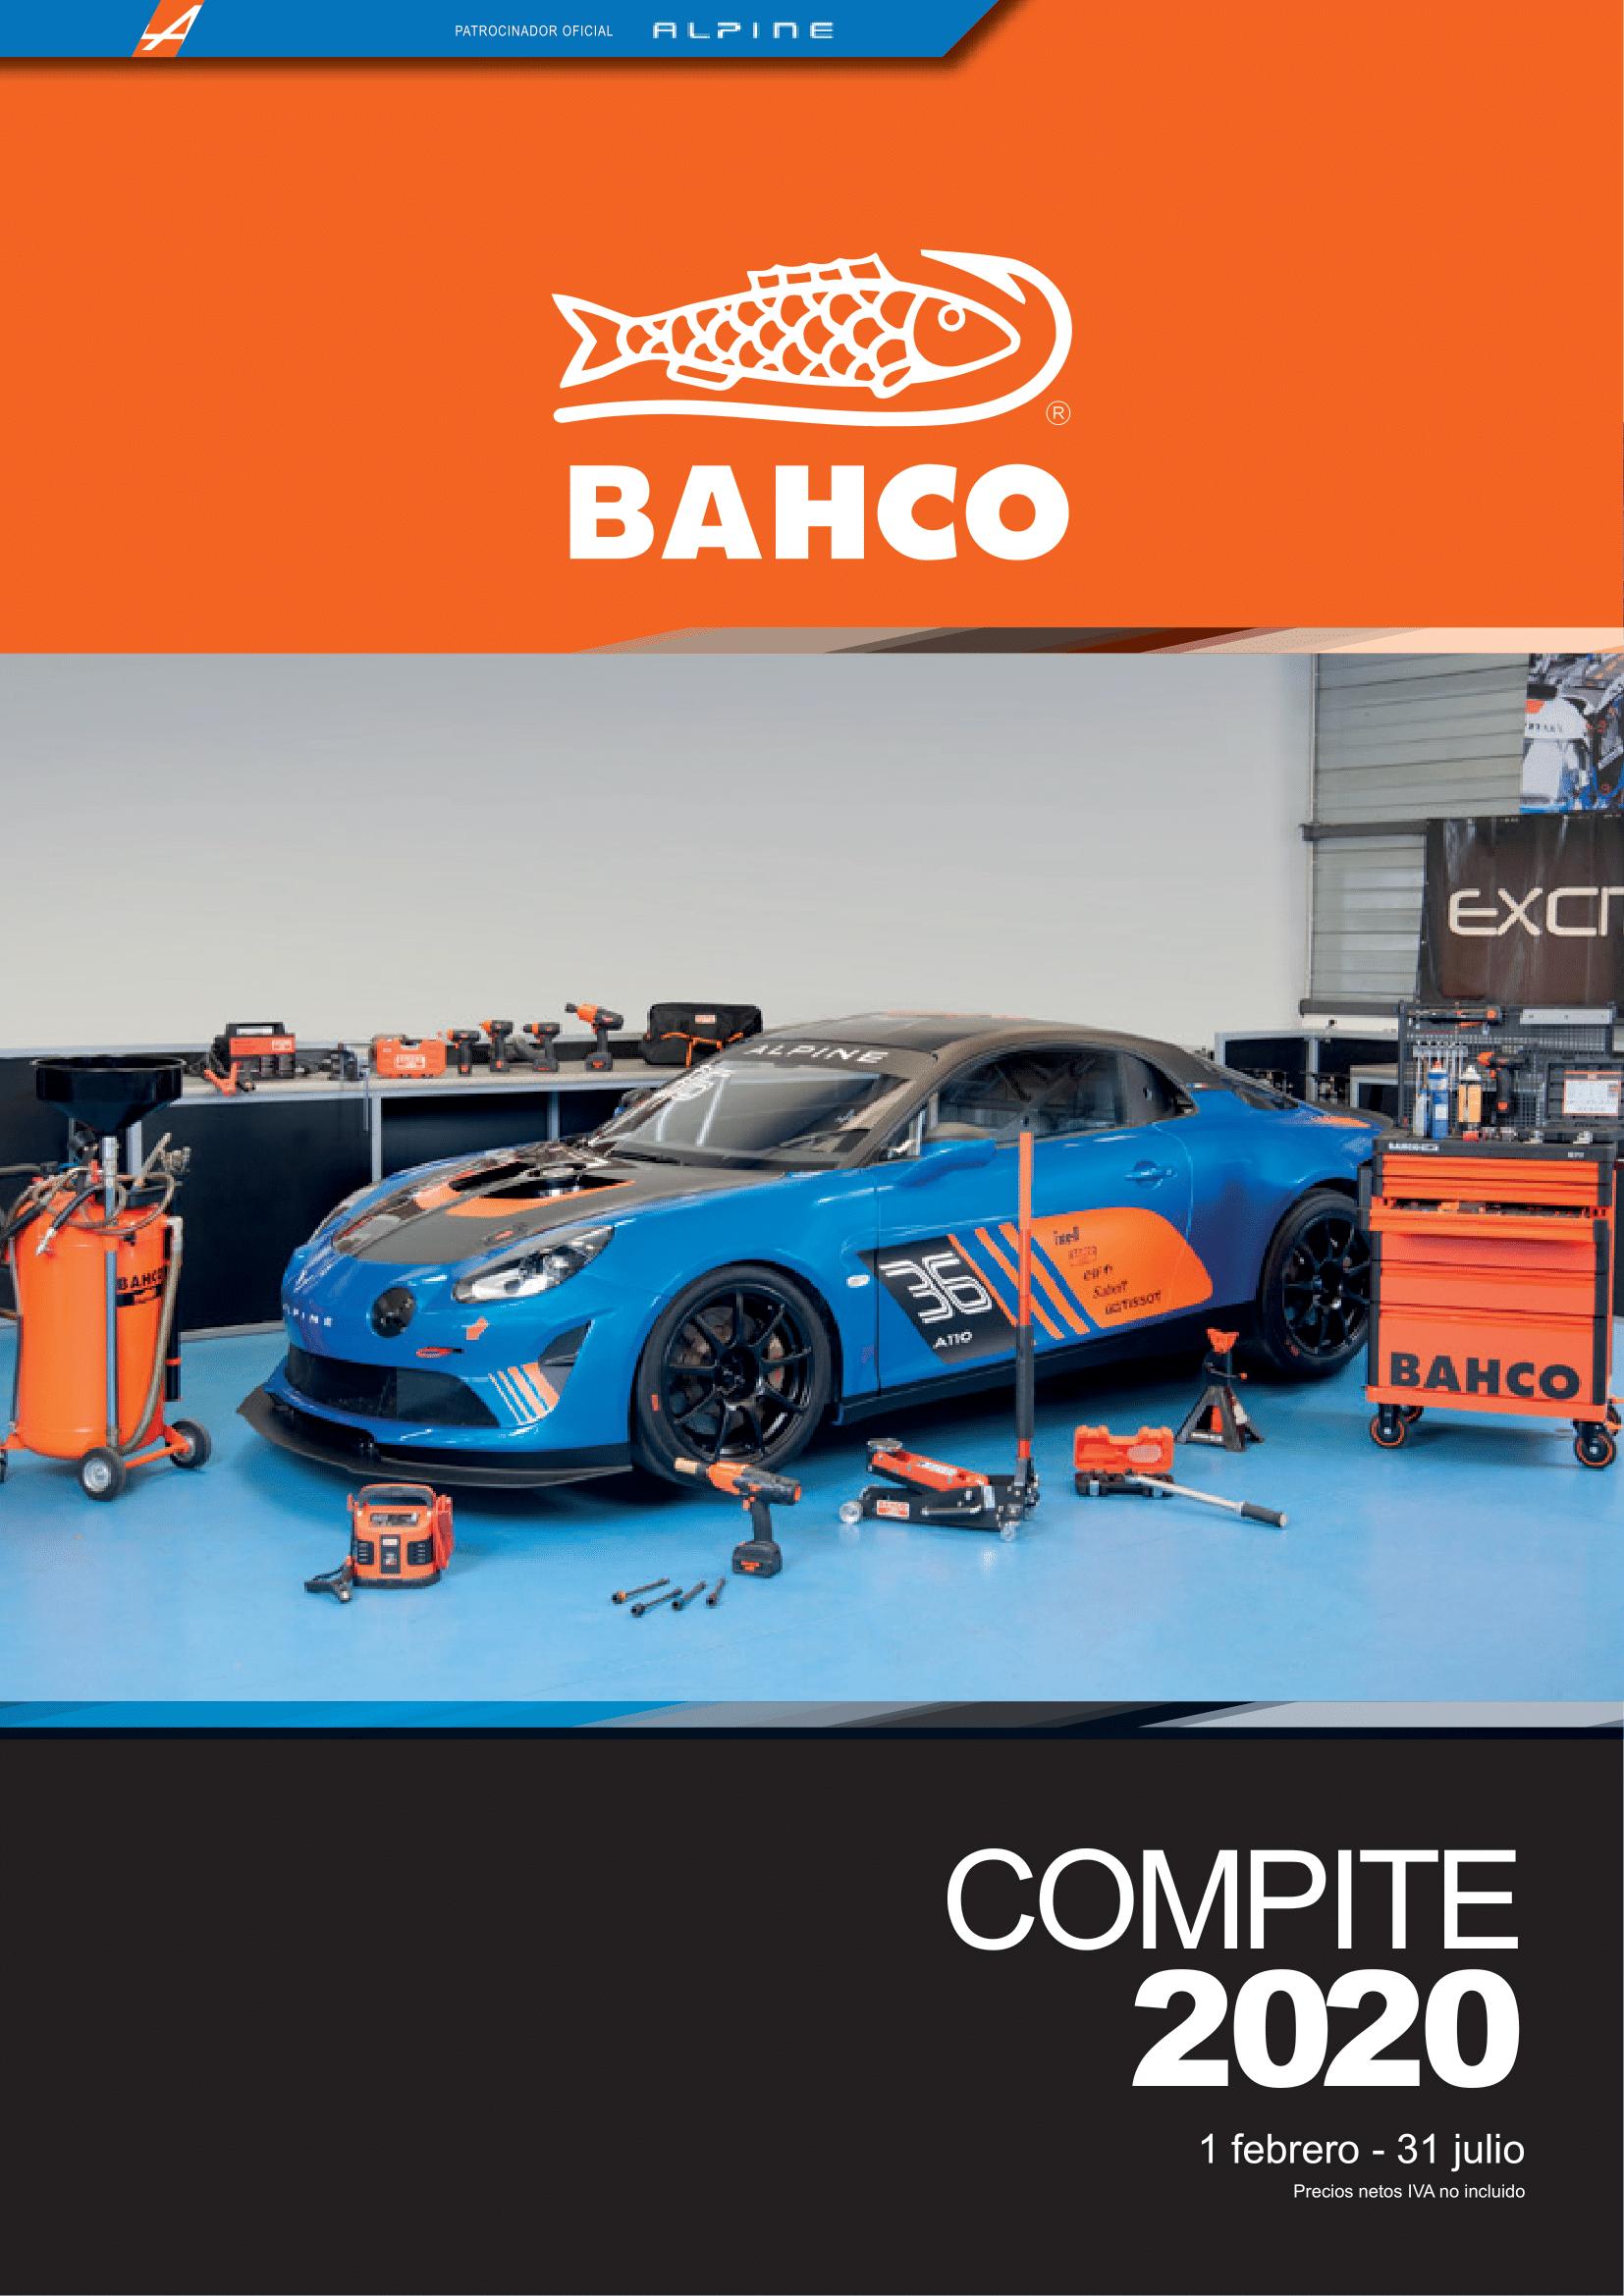 BAHCO COMPITE 2019